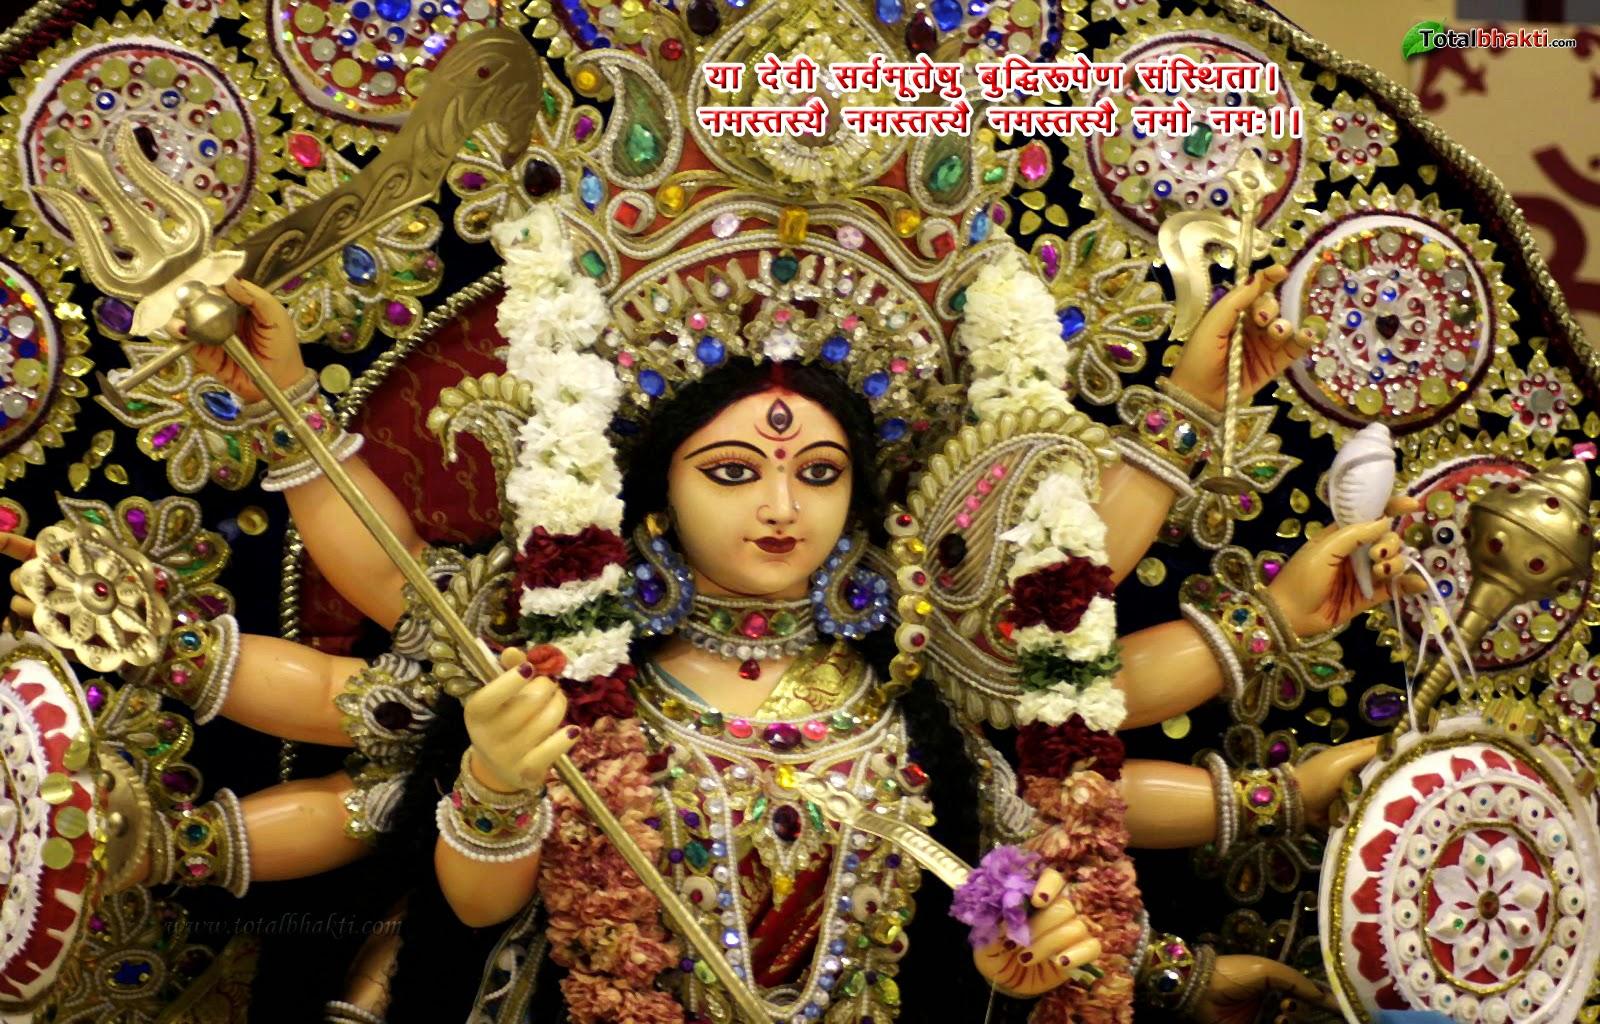 Wallpaper download navratri - Download Navratri Hd Photos Images For Mobile And Desktop